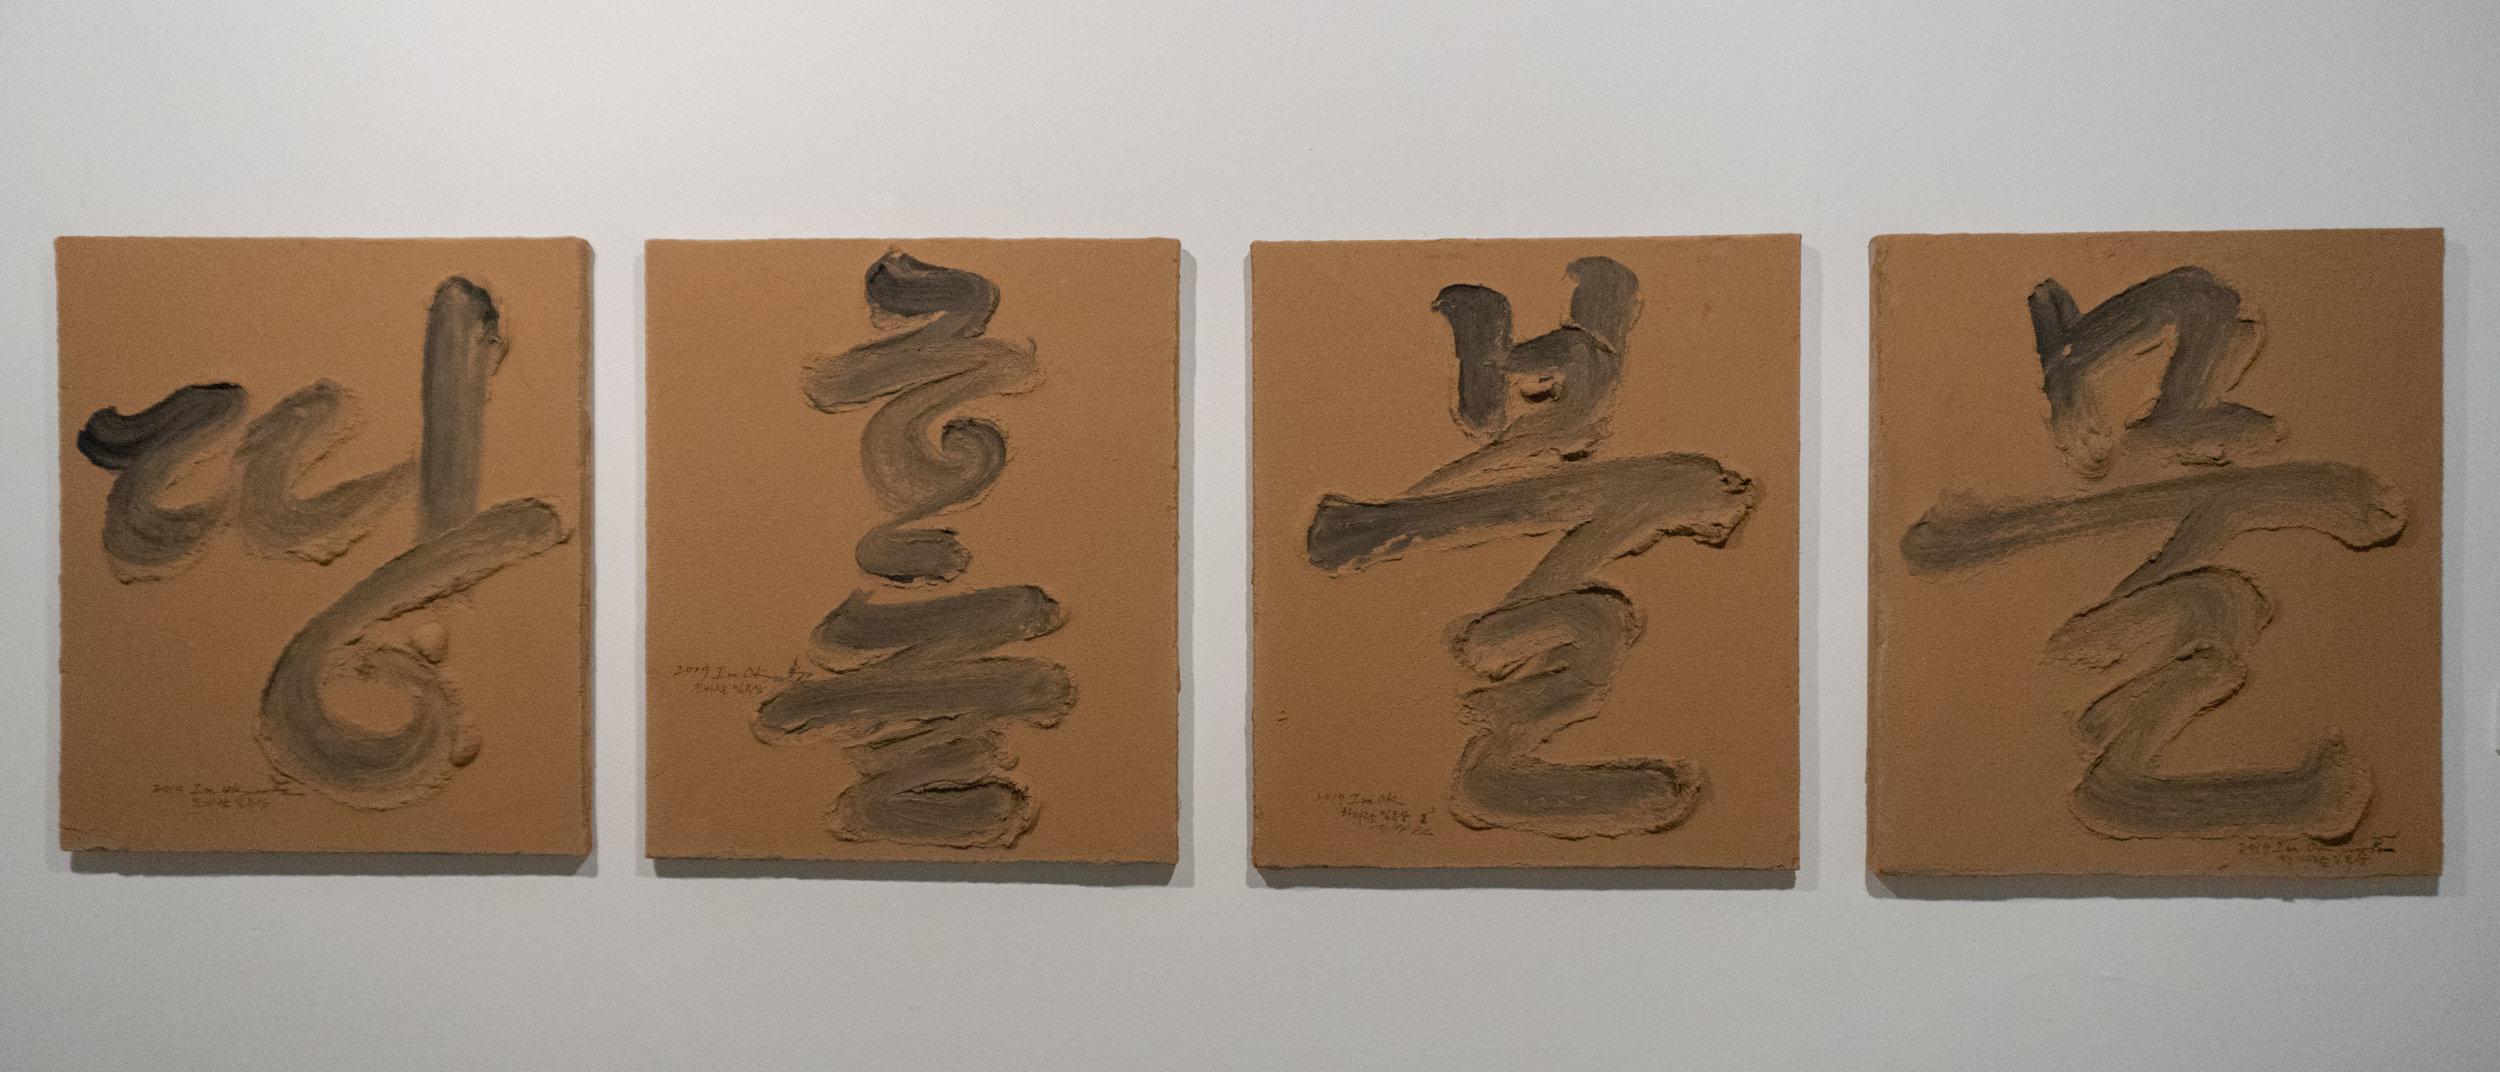 Lim Oksang 임옥상 b.1950   Land, Heurk, Fire, Water땅,흙,물,불 2019 Ink and soil 44 x 33 in